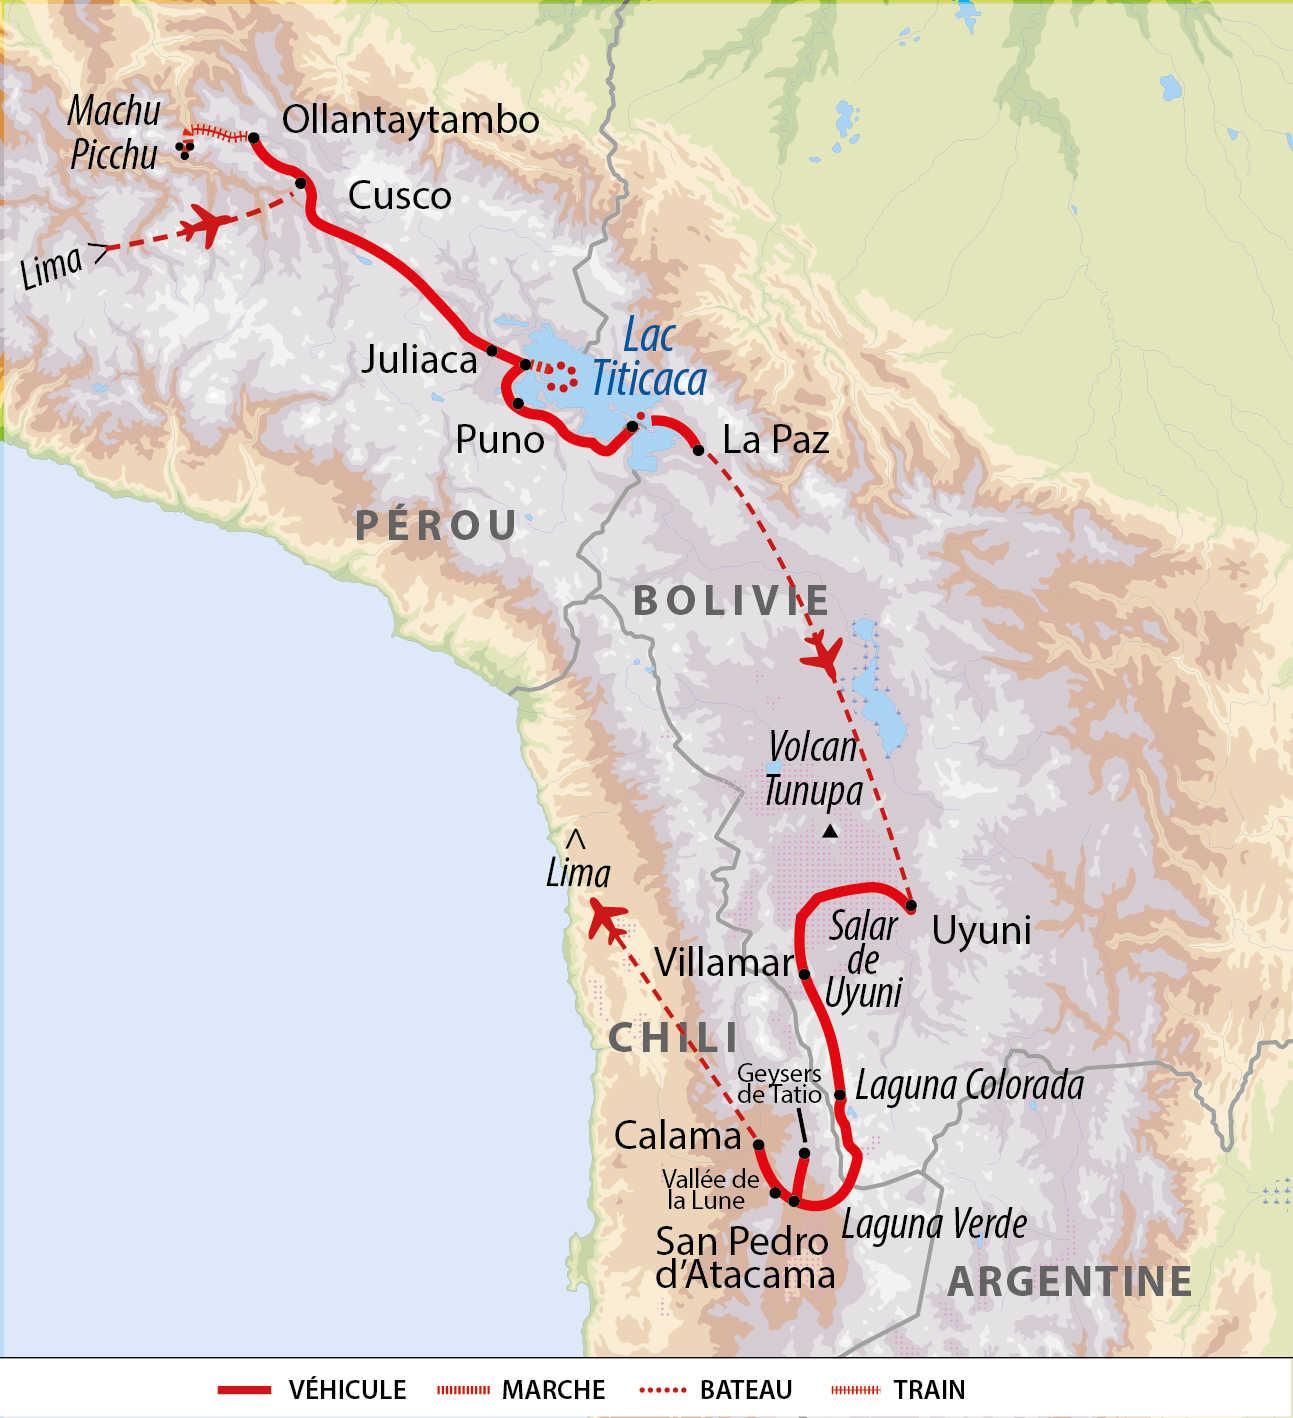 Carte voyage découverte andine : de Cusco au Sud Lipez